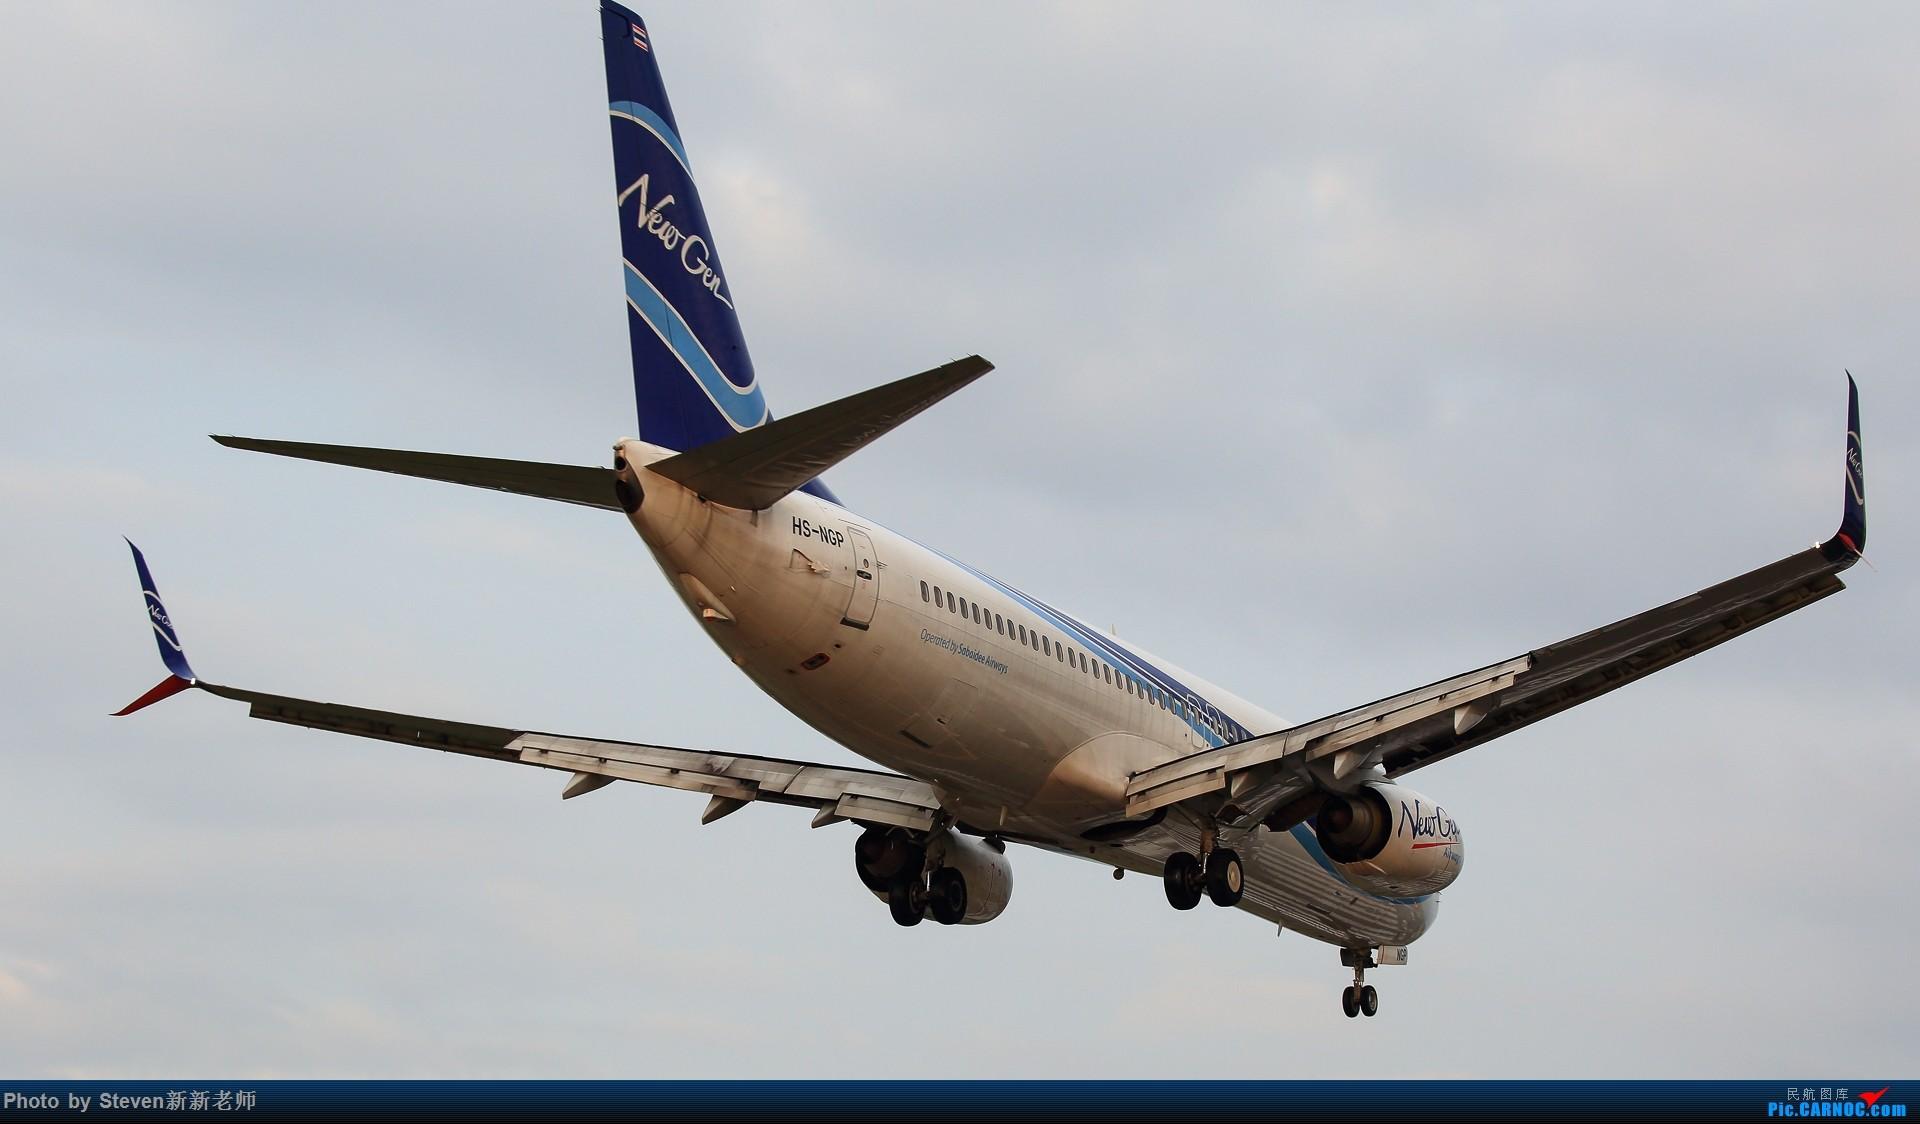 "Re:[原创]亚洲""圣马丁岛""—普吉国际机场拍机 BOEING 737-800 HS-NGP 泰国普吉机场"